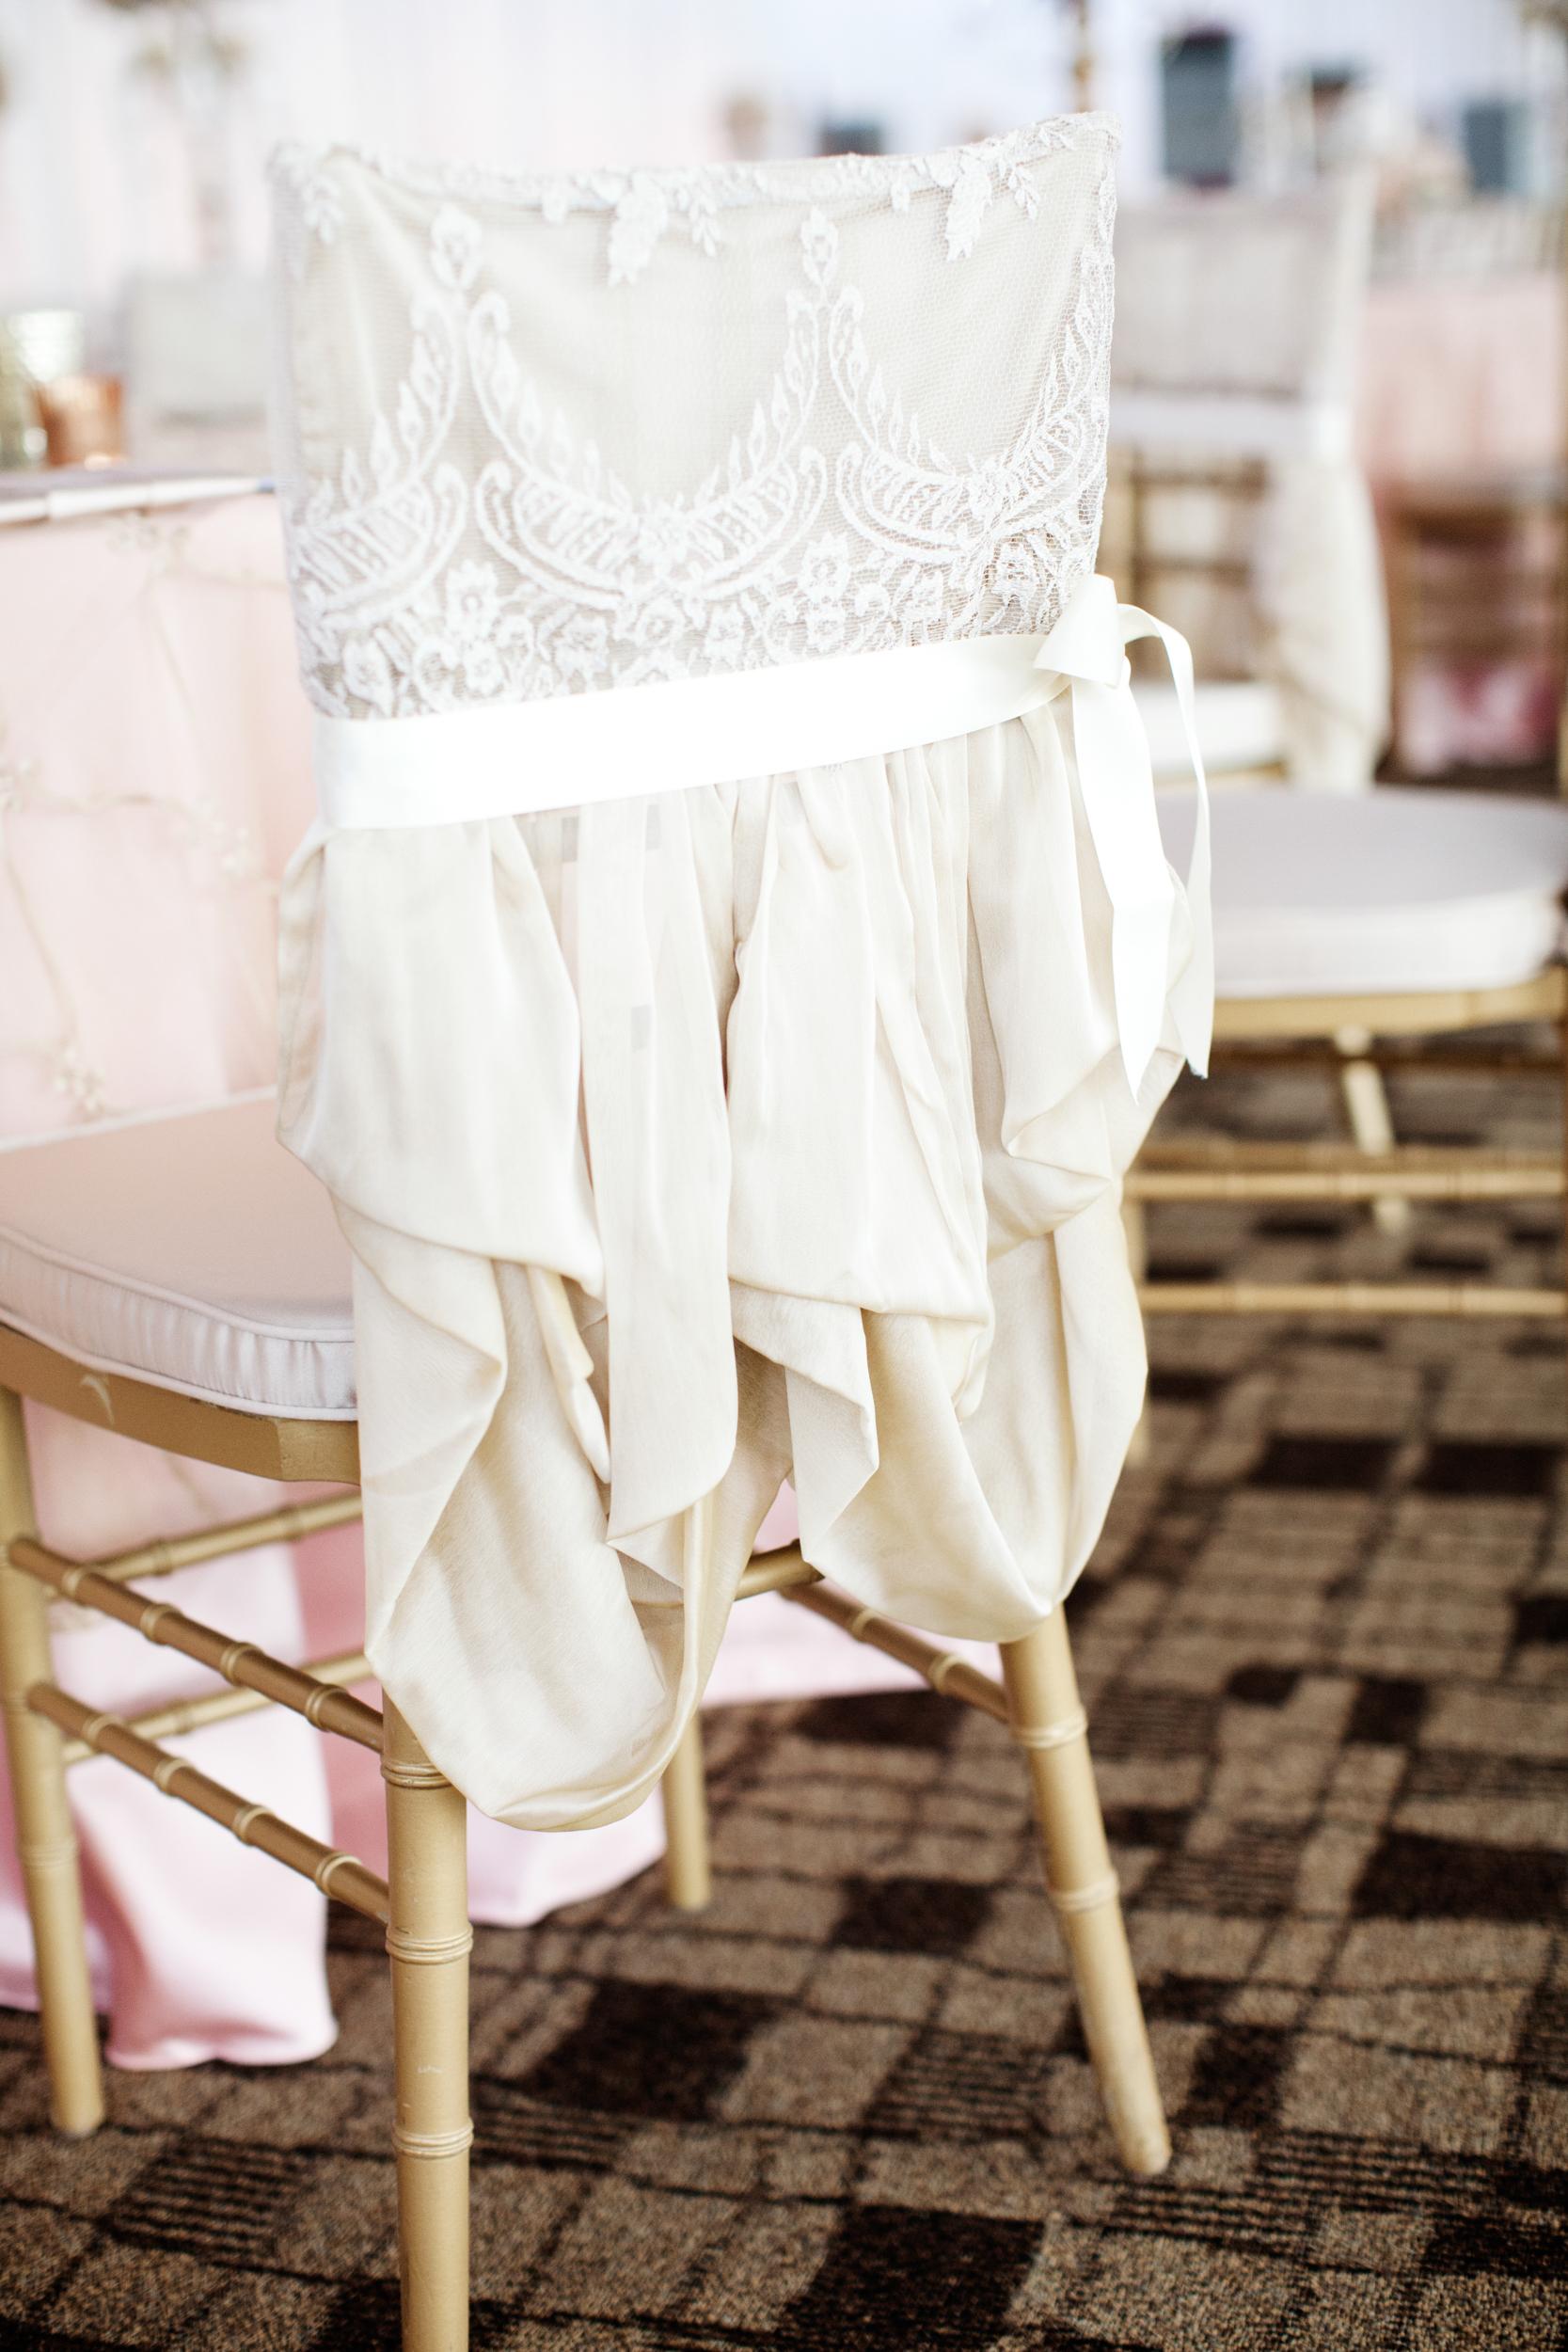 Ceci_New_York_Ceci_Style_Ceci_Johnson_Luxury_Lifestyle_Floral_Lace_Wedding_Letterpress_Inspiration_Design_Custom_Couture_Personalized_Invitations_-133.jpg